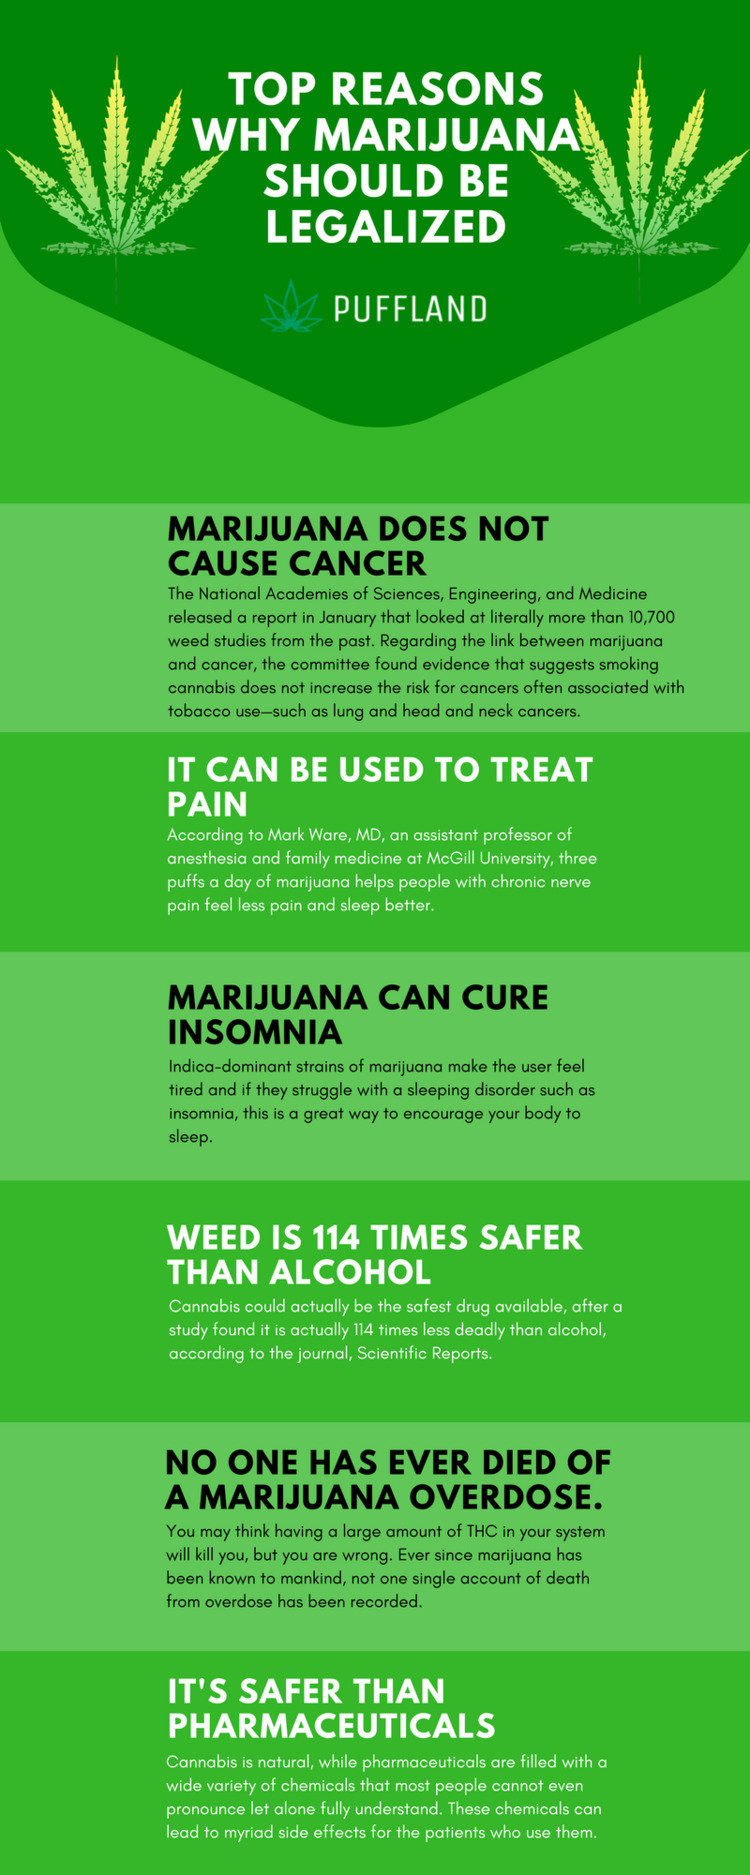 Top Reasons Marijuana Legalized - pufflandcanada   ello